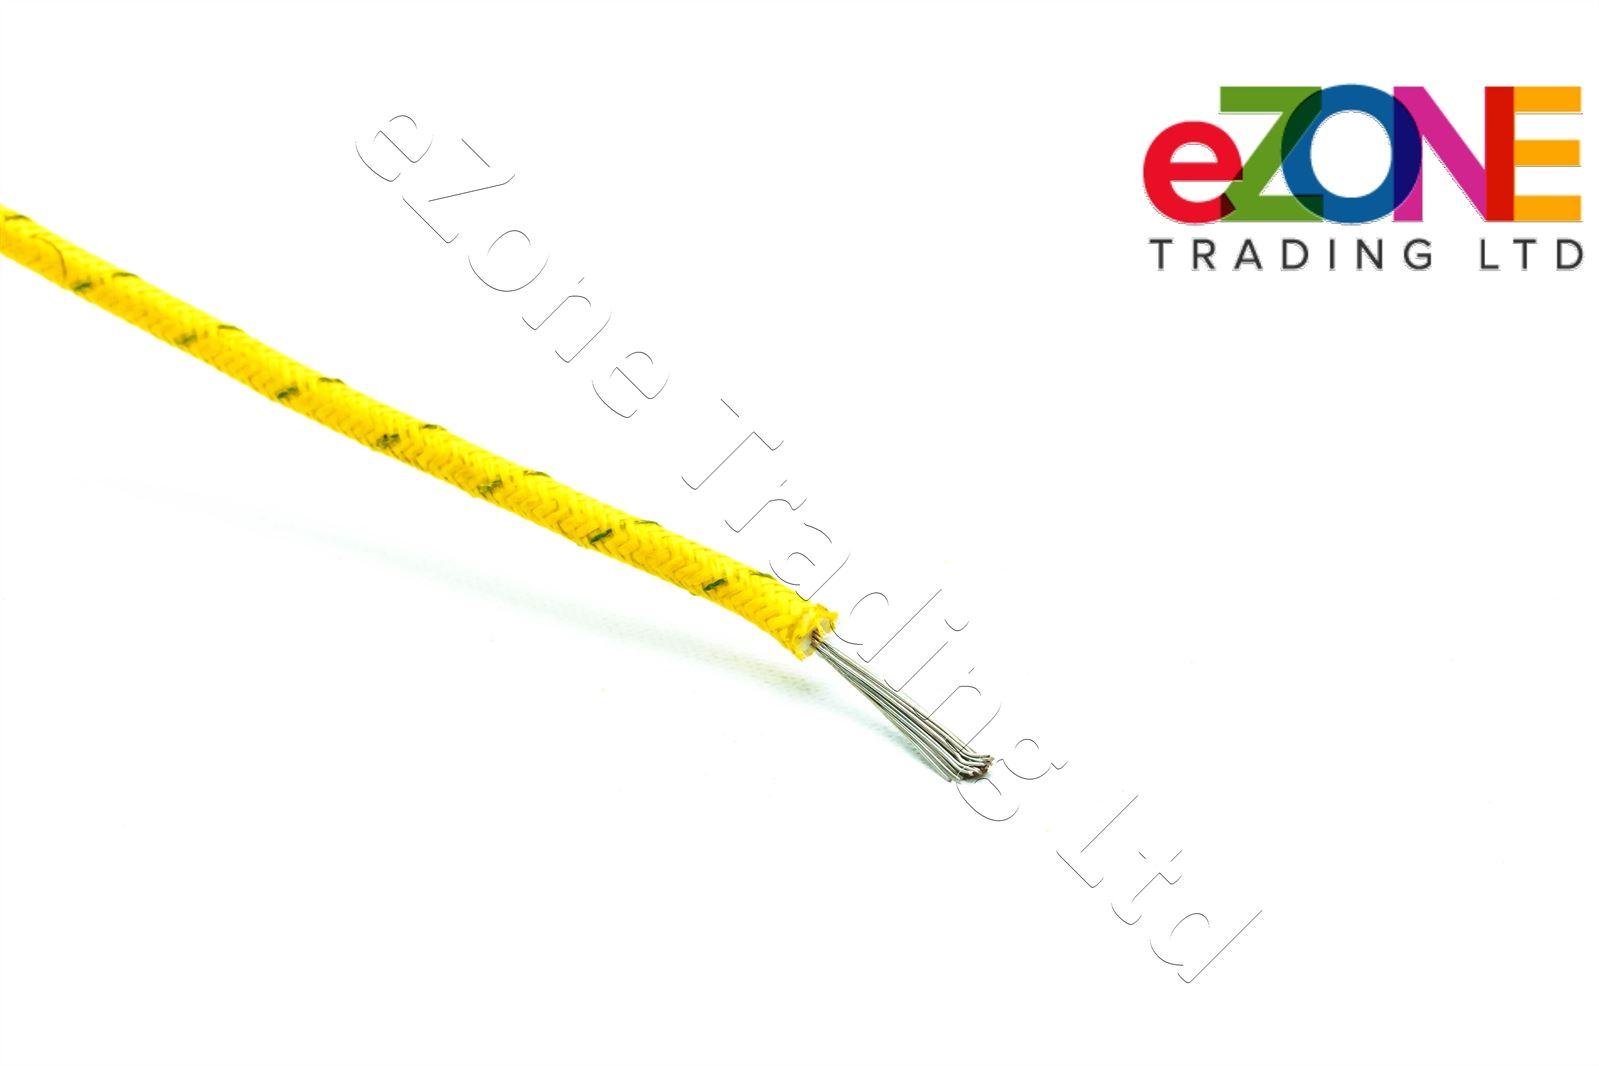 Mm Glass Fibre High Temp Cable